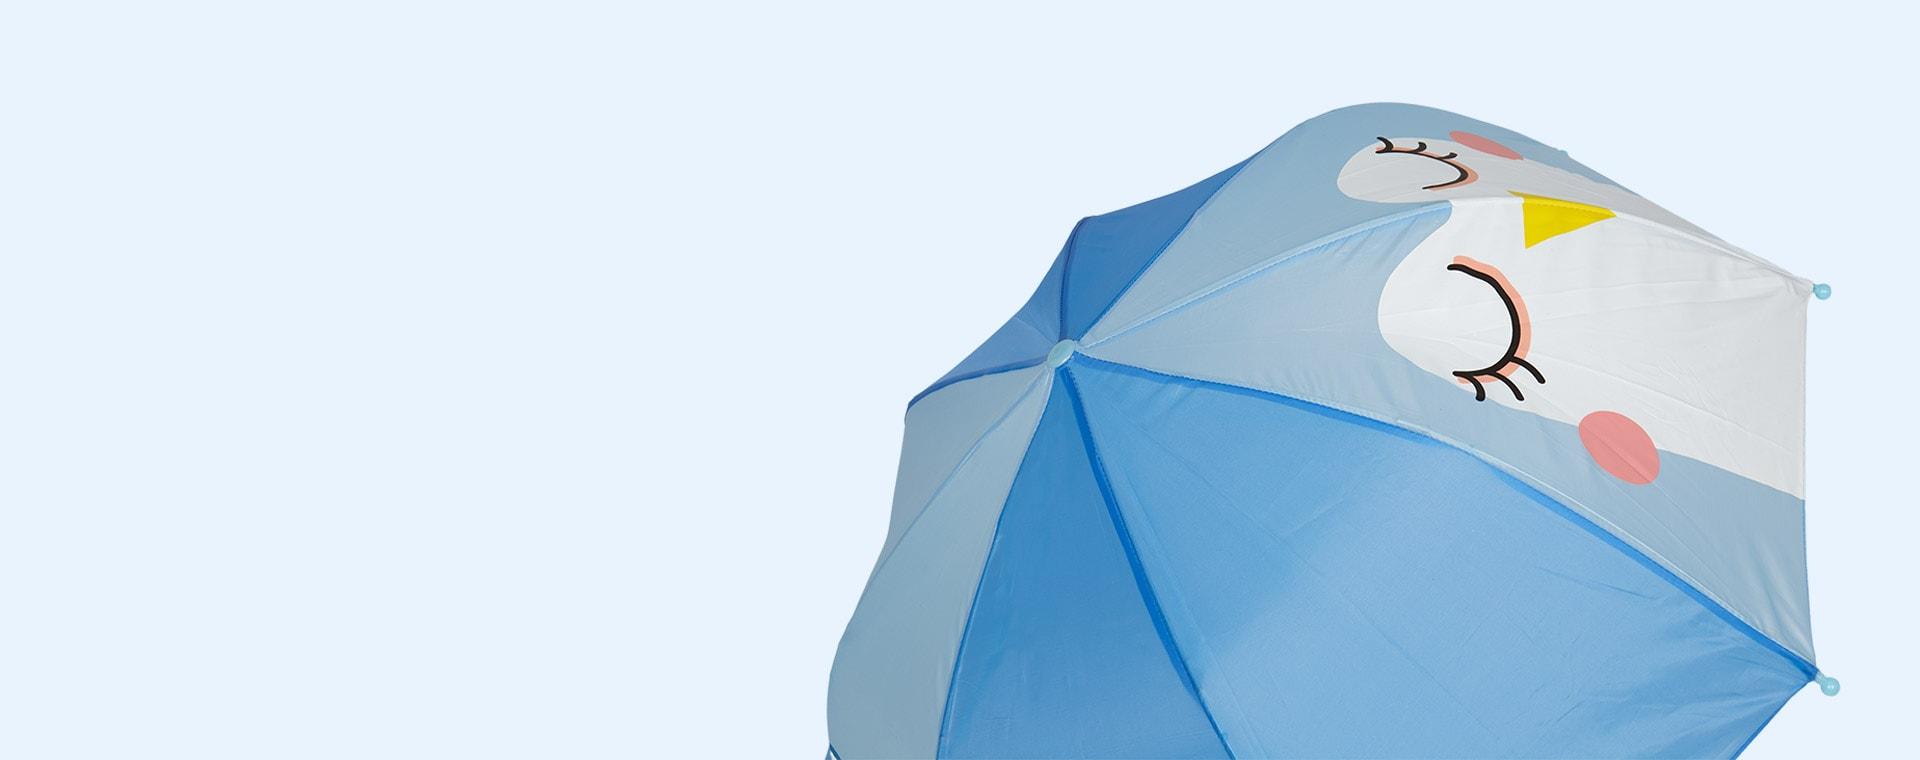 Penguin Sunnylife Kids Umbrella